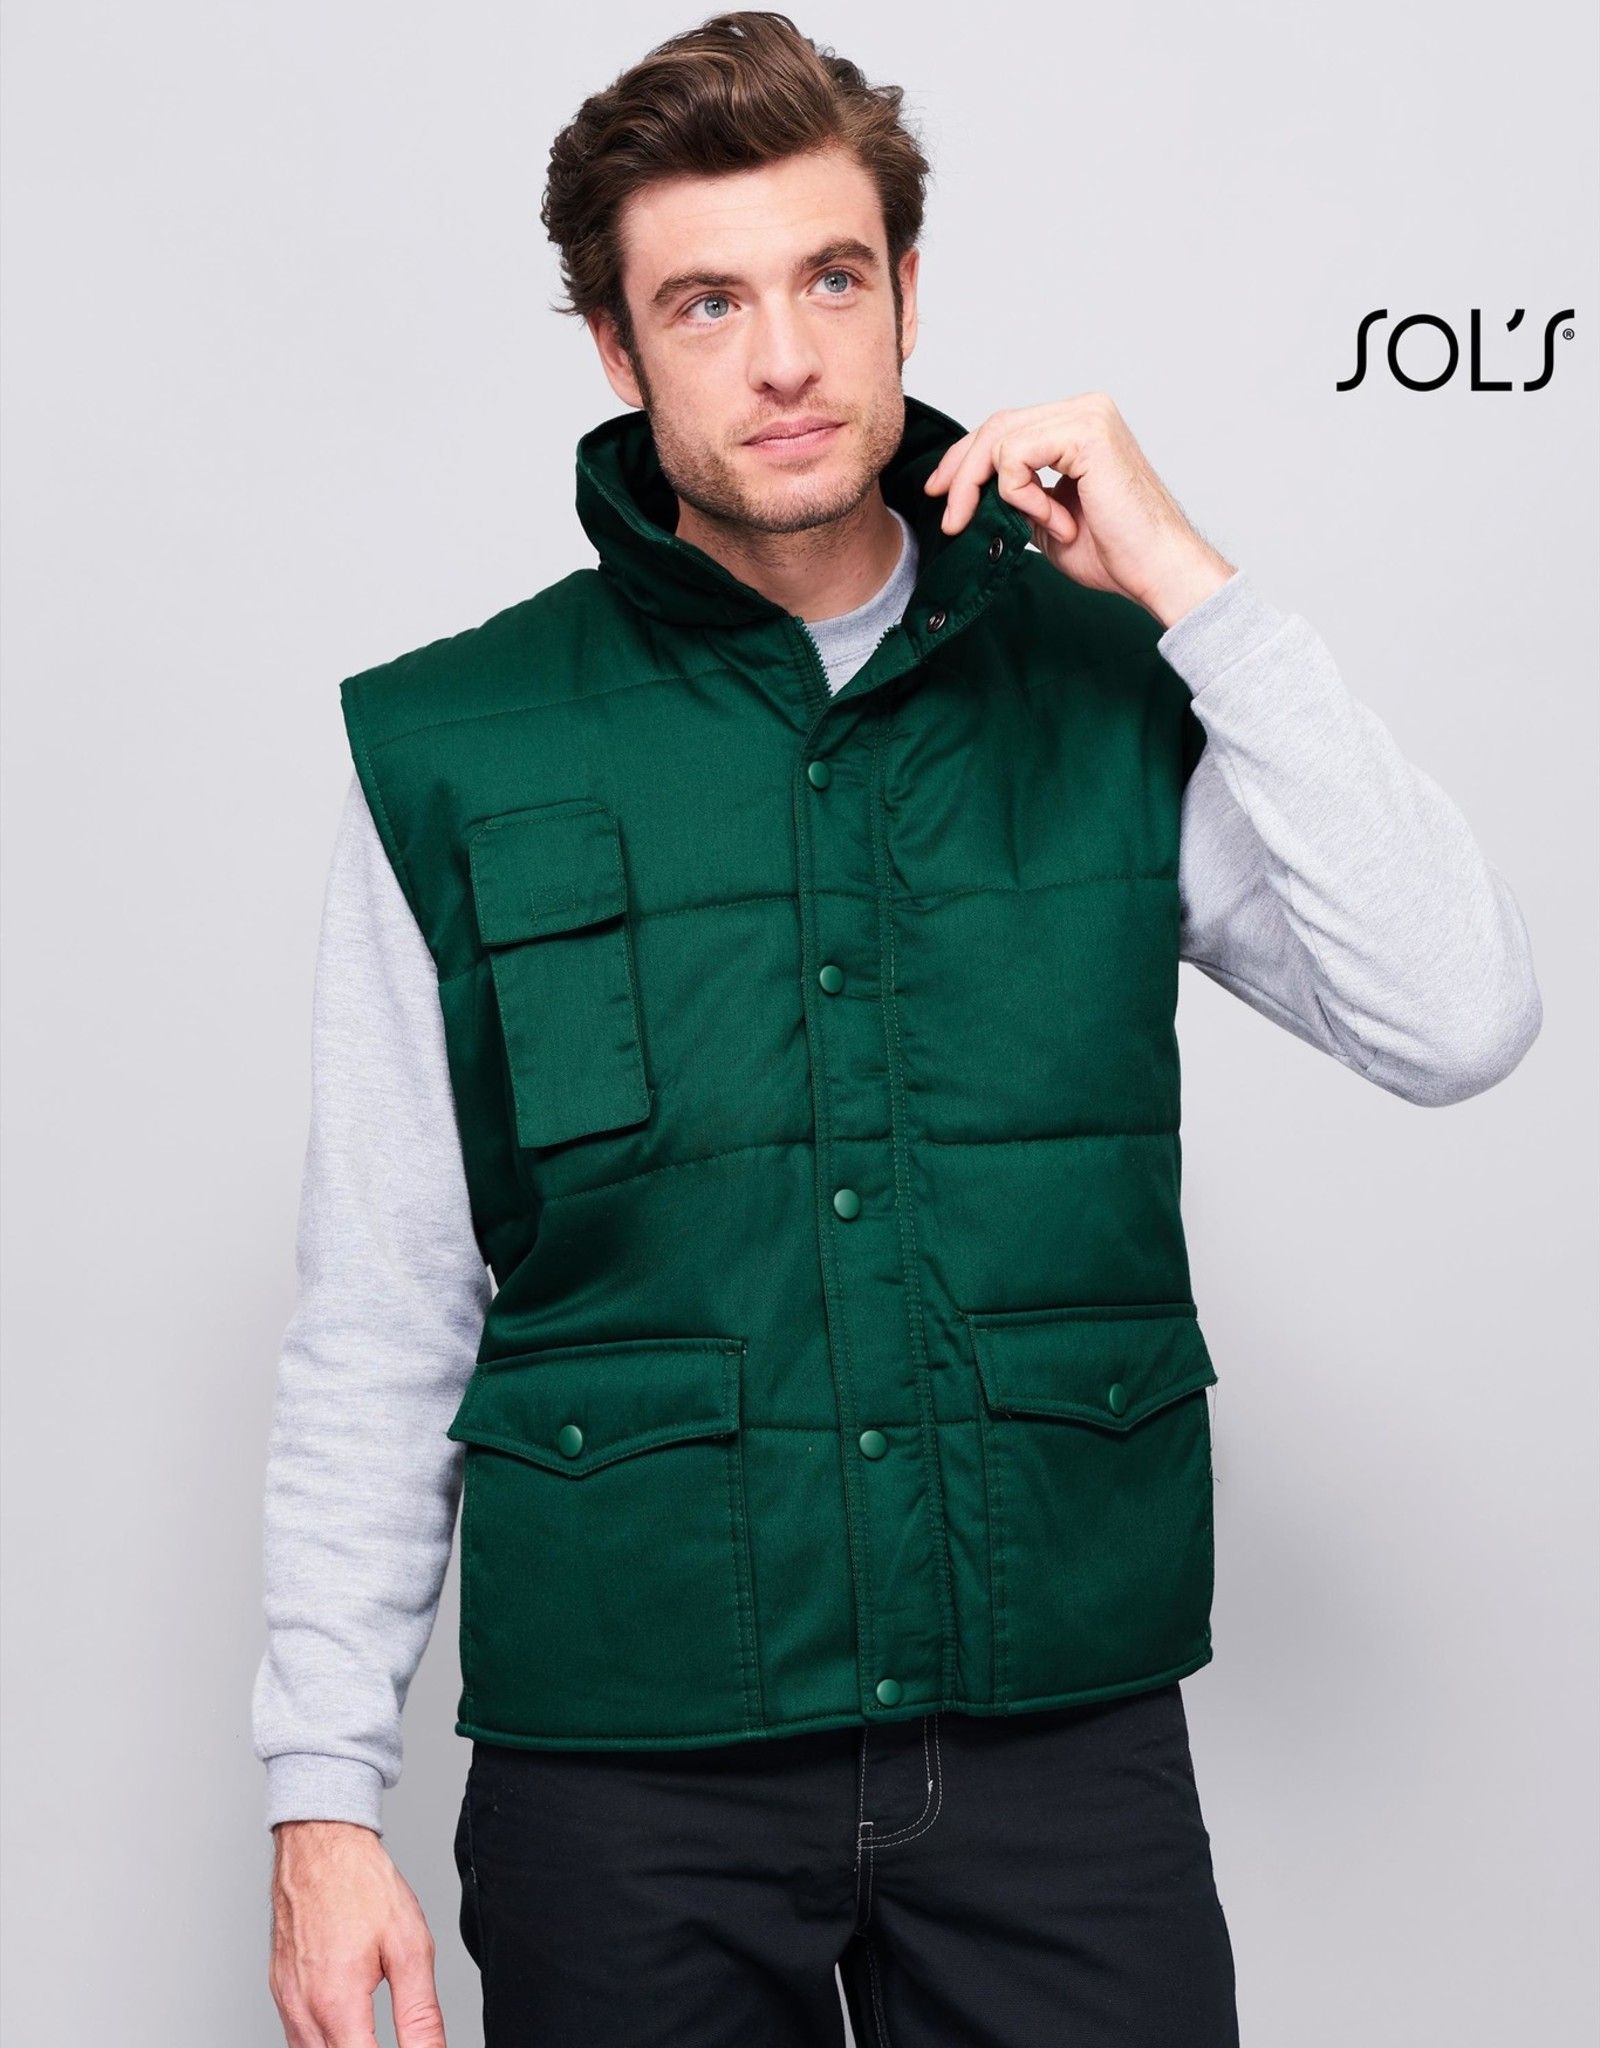 Sol's BODYWARMER 'Equinox' workwear navy